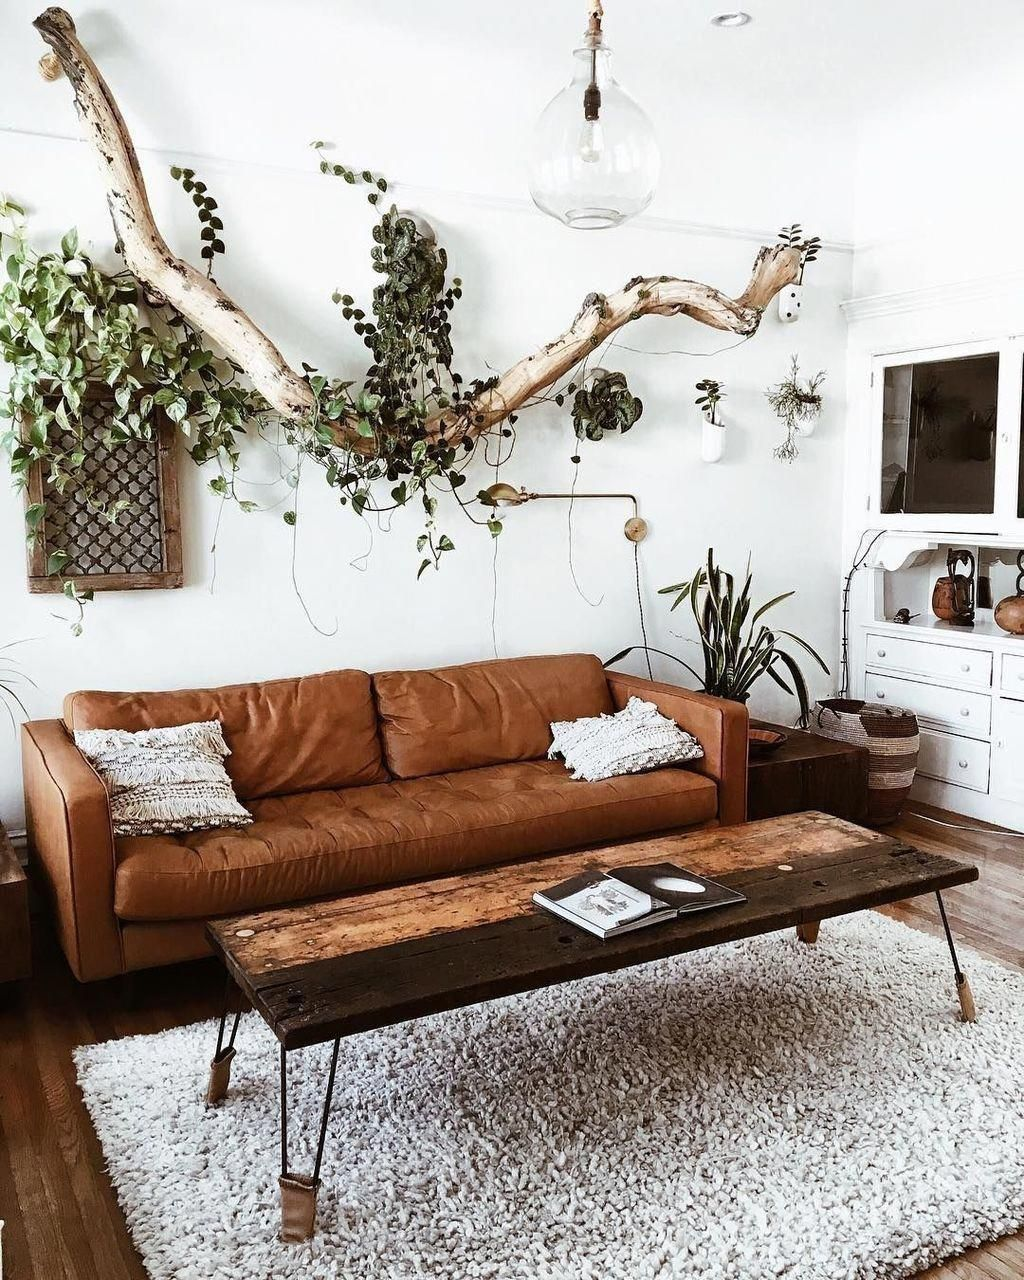 Living Room Decor At Mr Price Home Homedecorrustic Home Decor